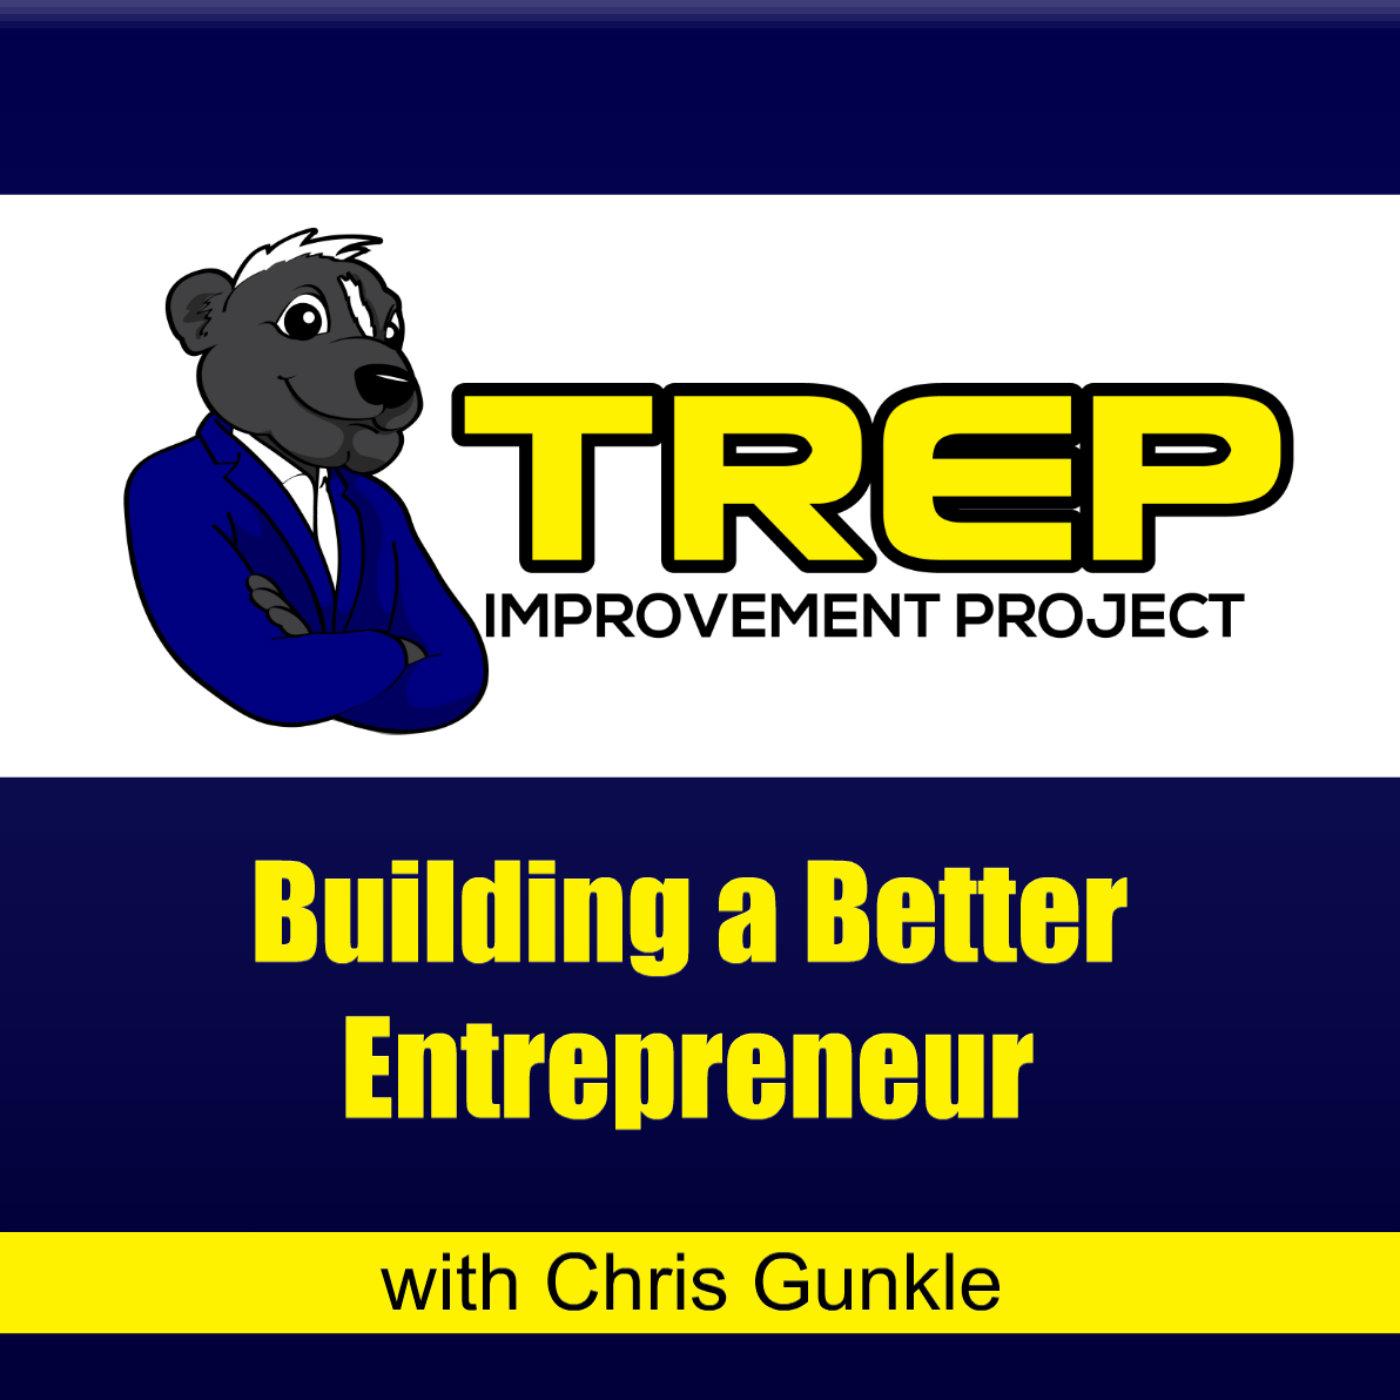 Trep Improvement Project